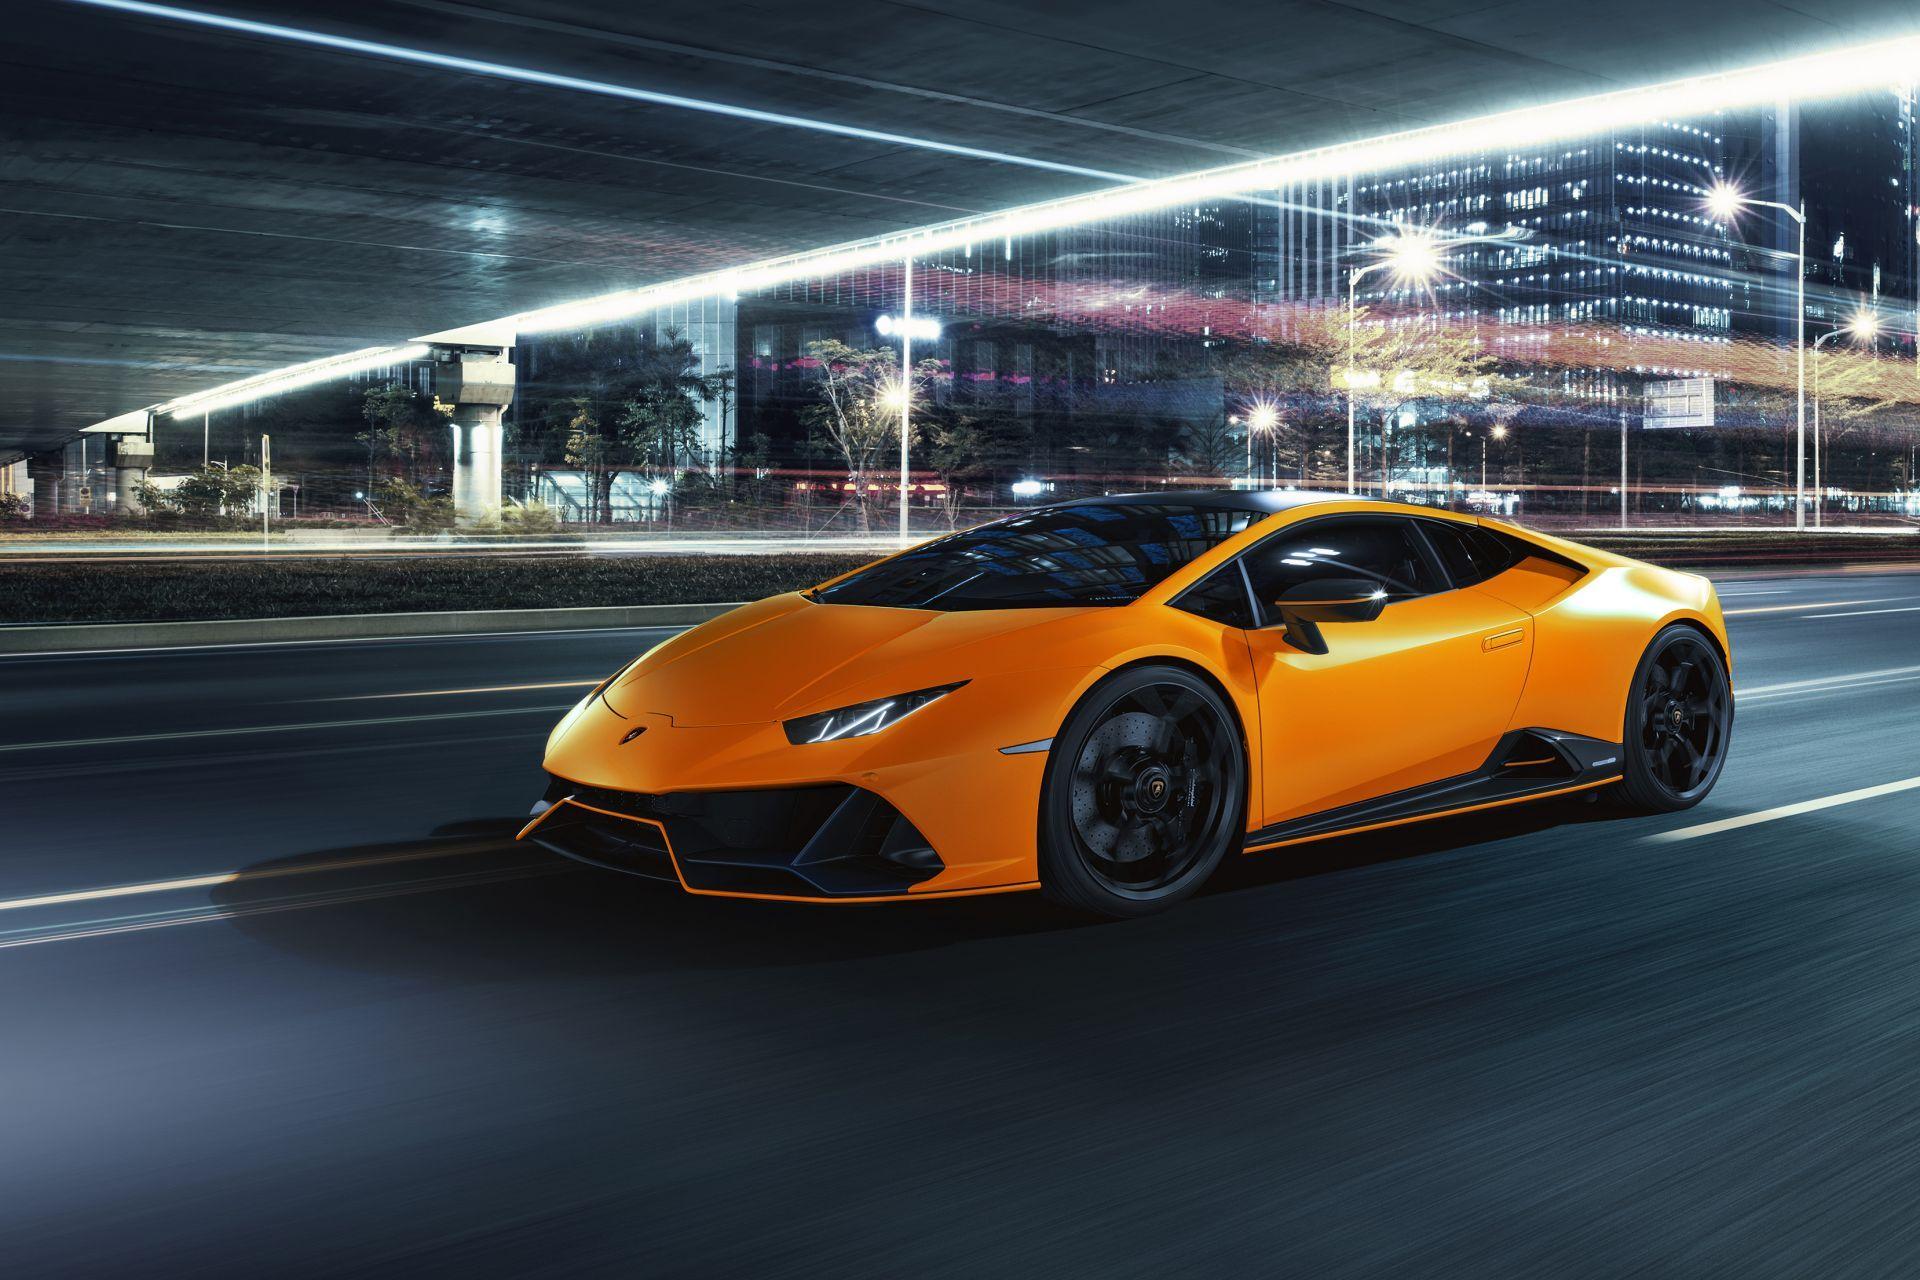 Lamborghini-Huracan-Evo-Fluo-Capsule-21